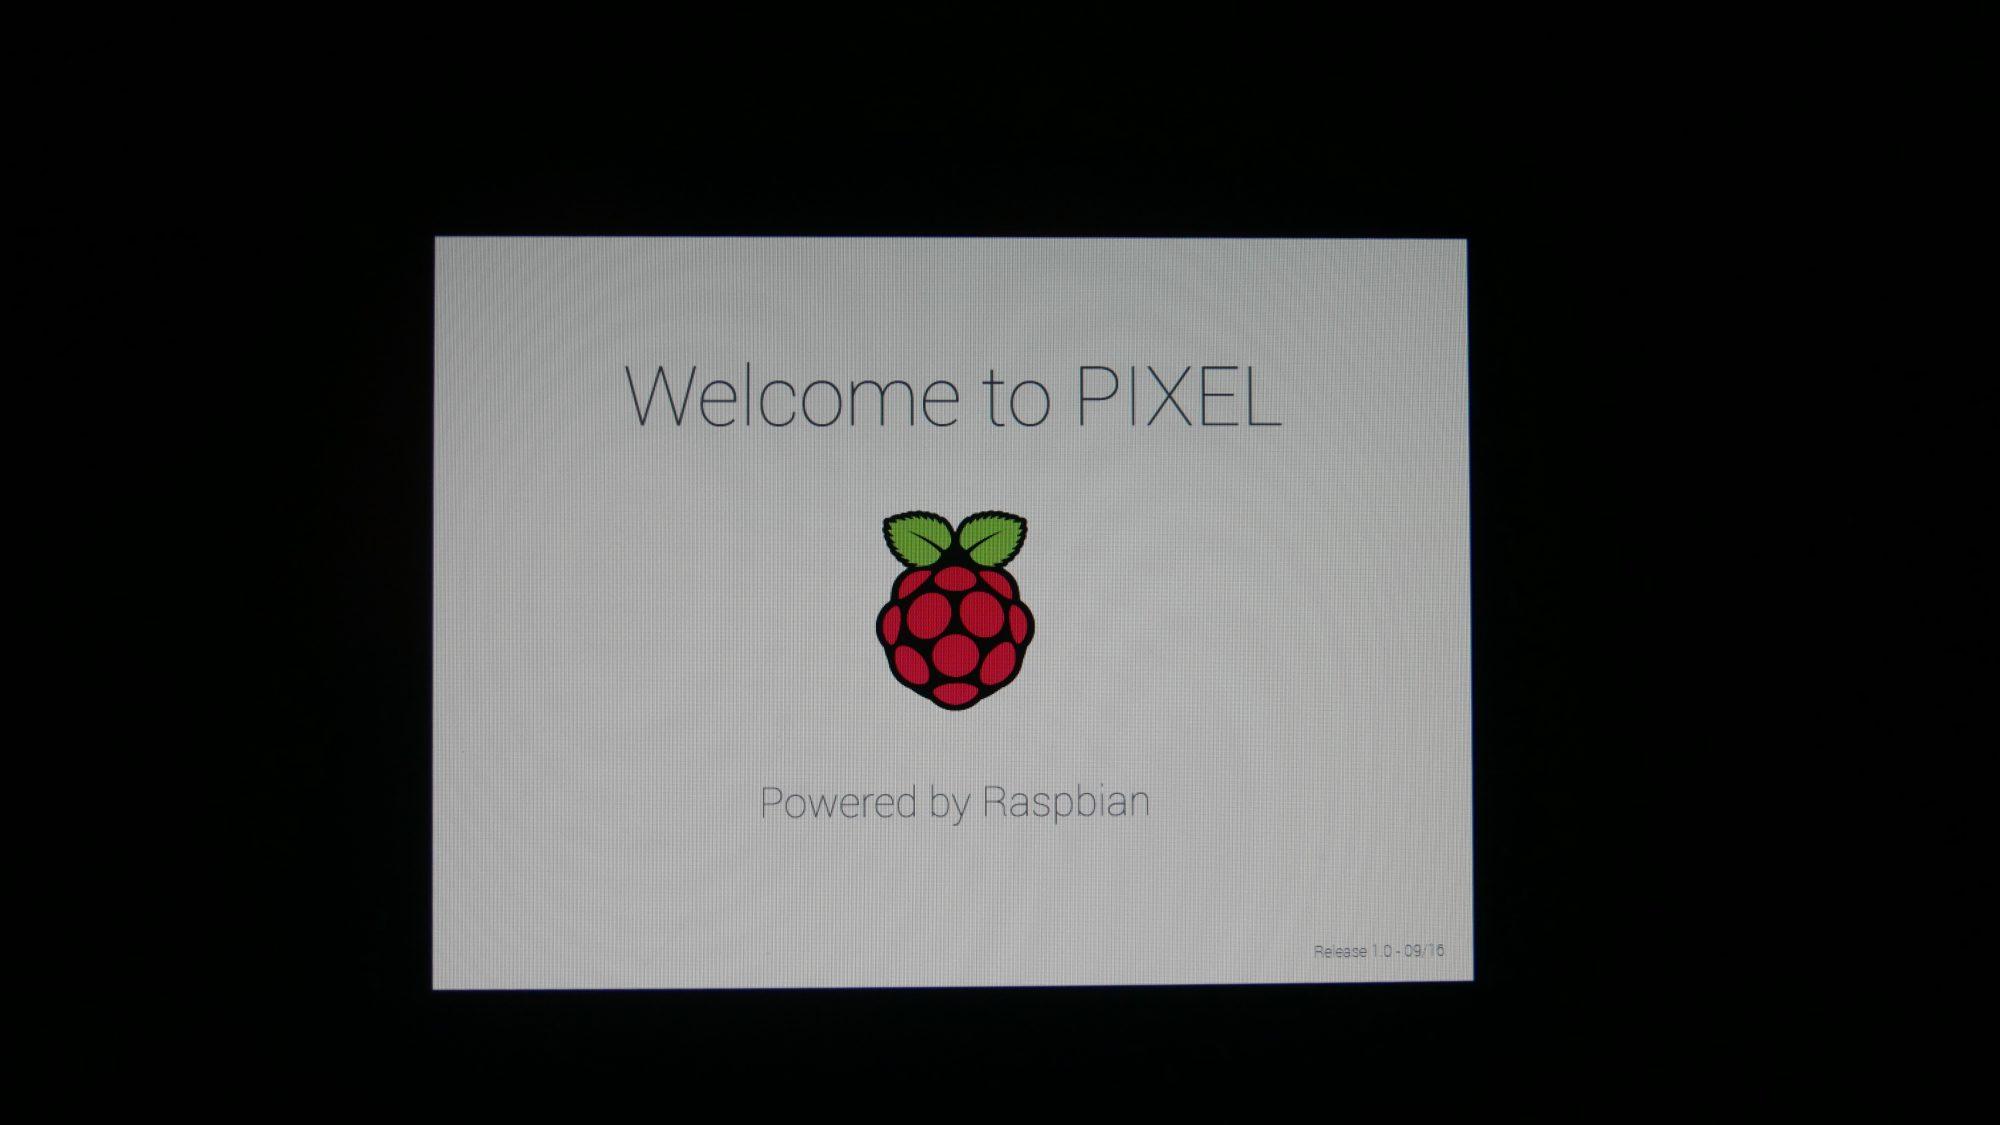 Nach circa 20 Minuten möchte Pixel uns kennenlernen.